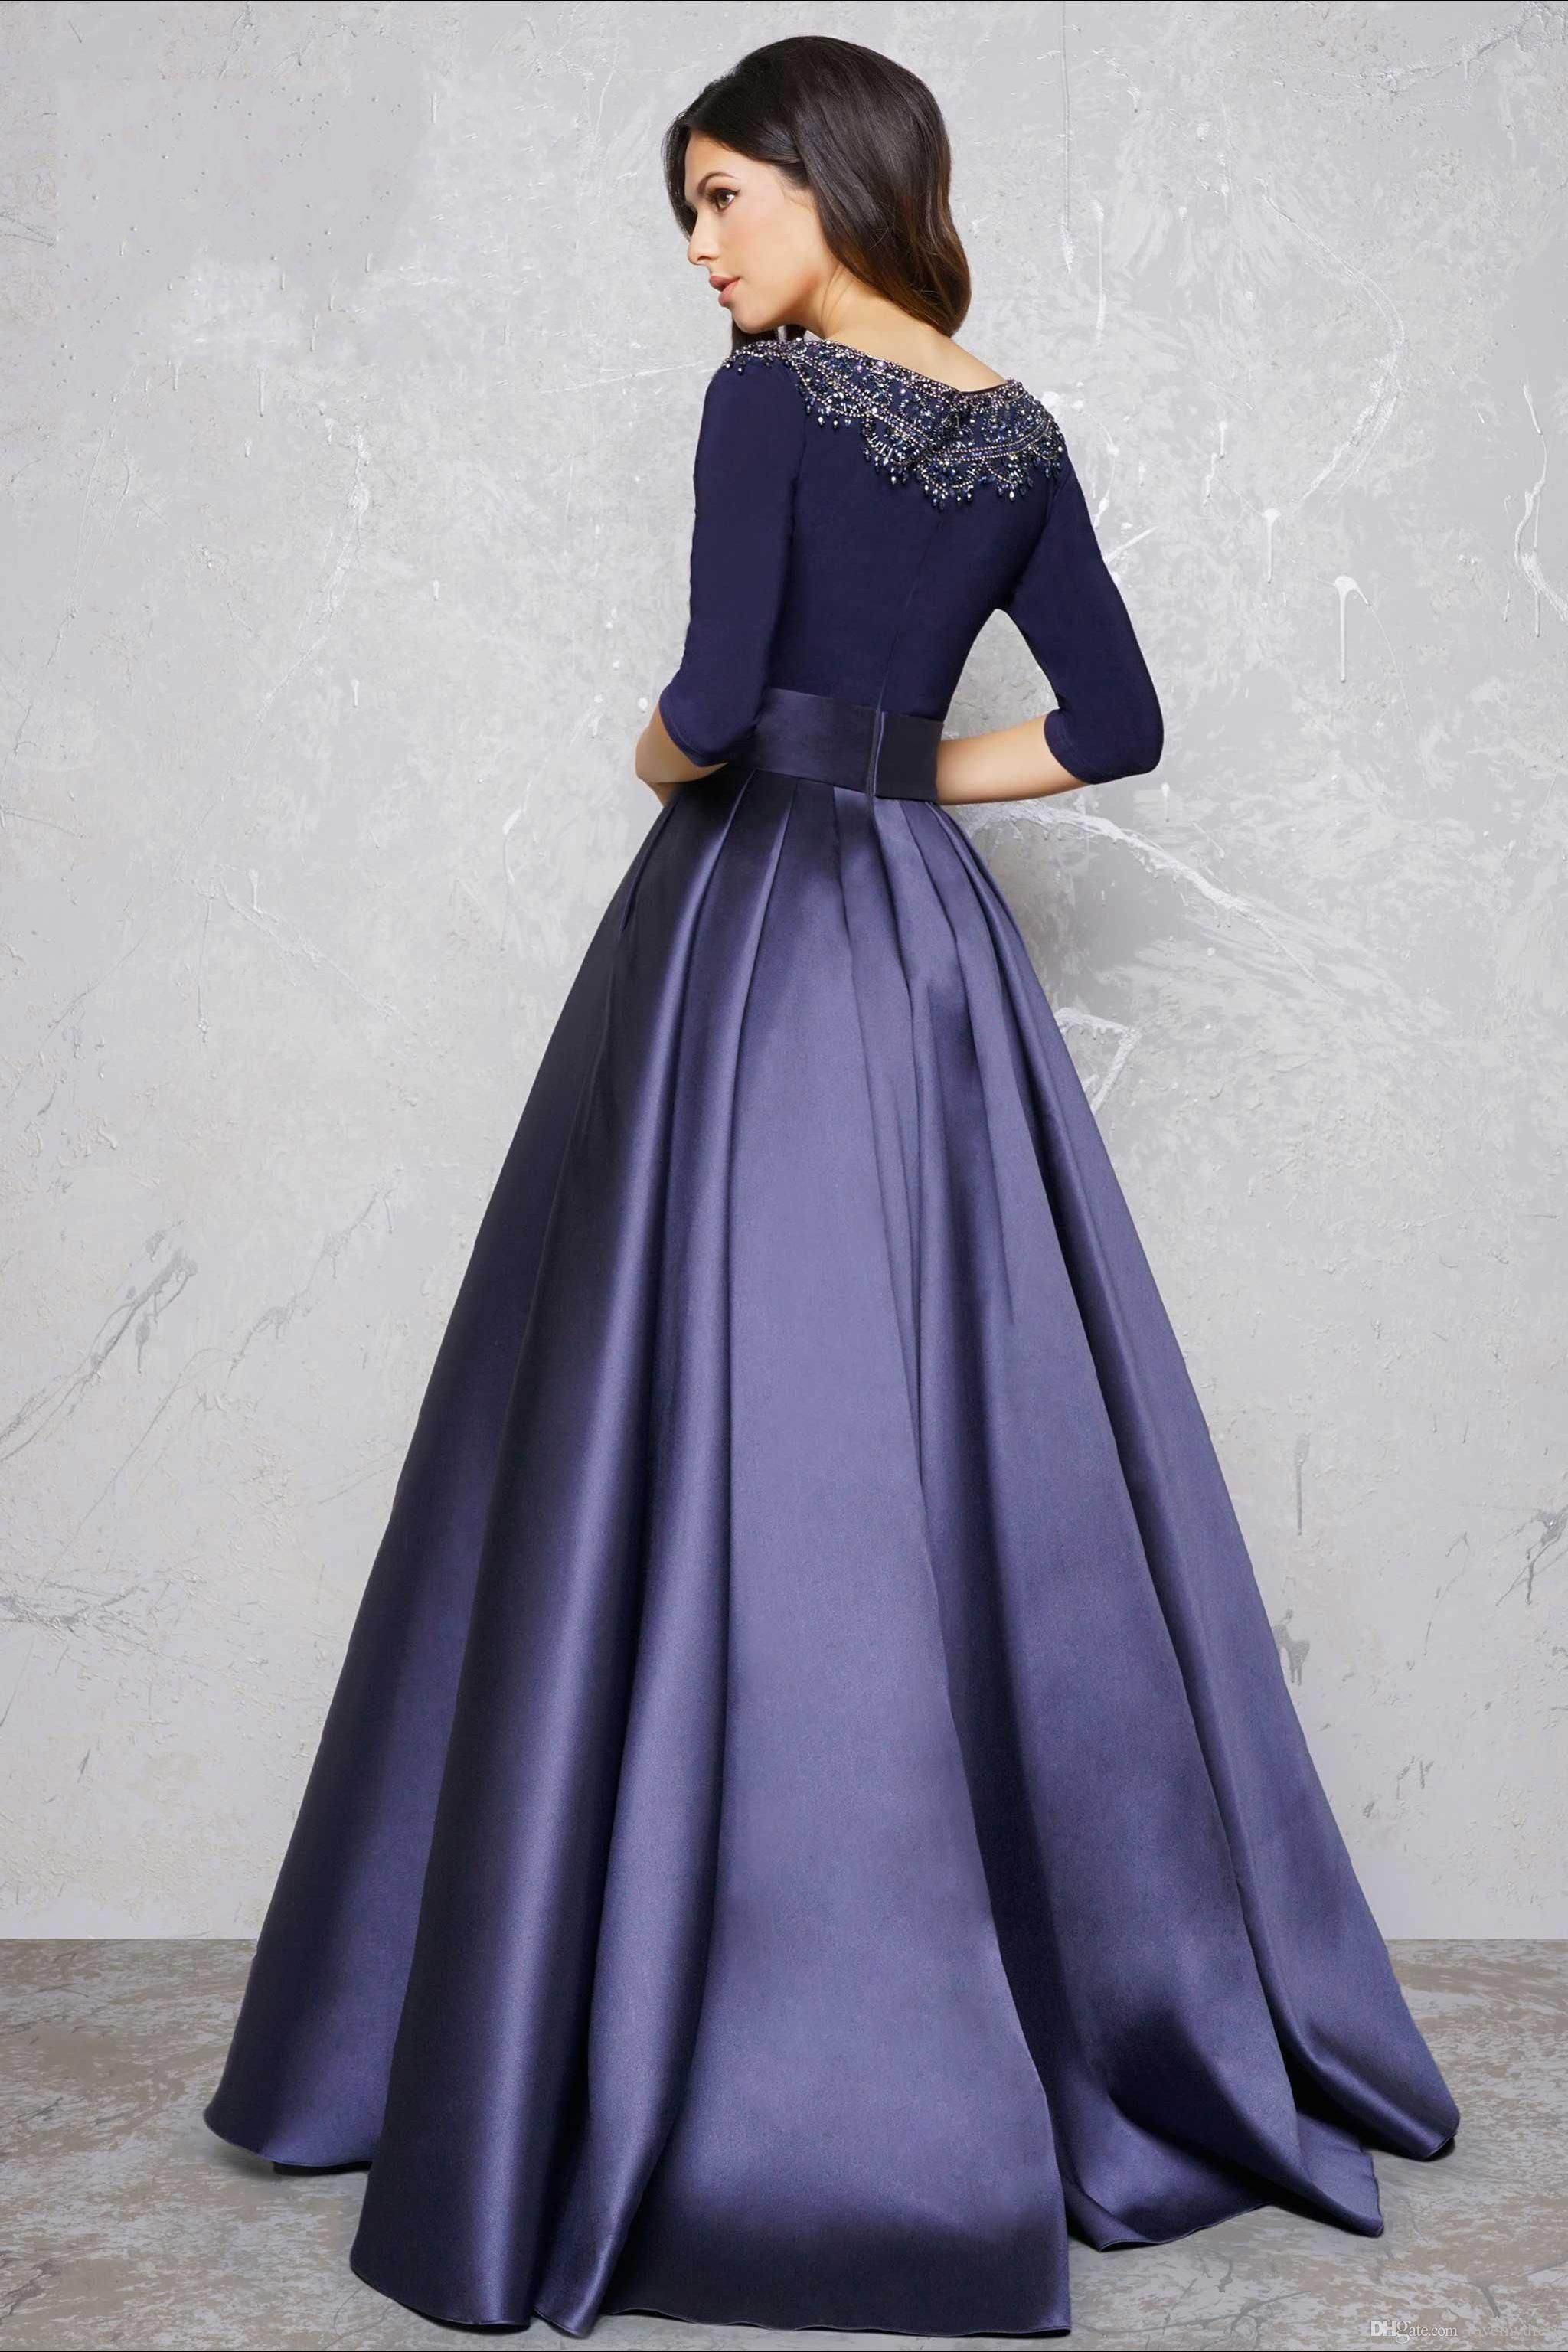 Long sleeve evening gowns formal dress a line party dress high